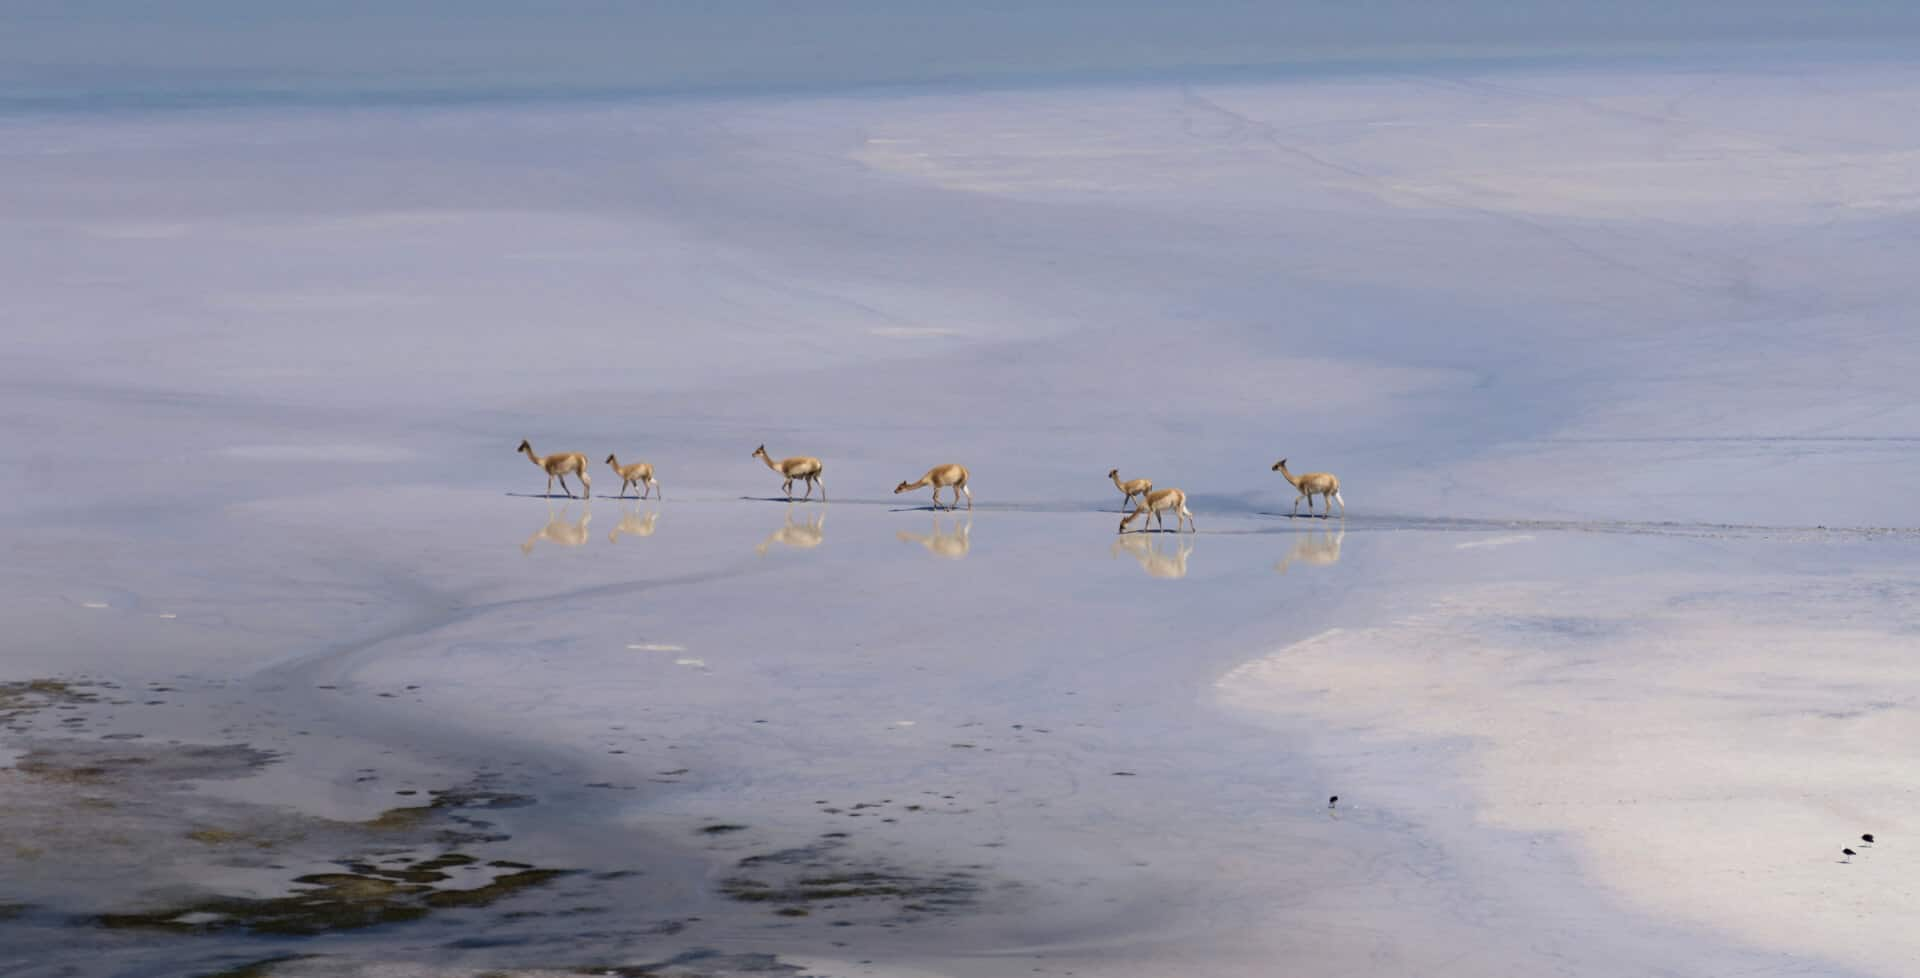 A pack of vicunas walking on the salt flats in San Pedro de Atacama